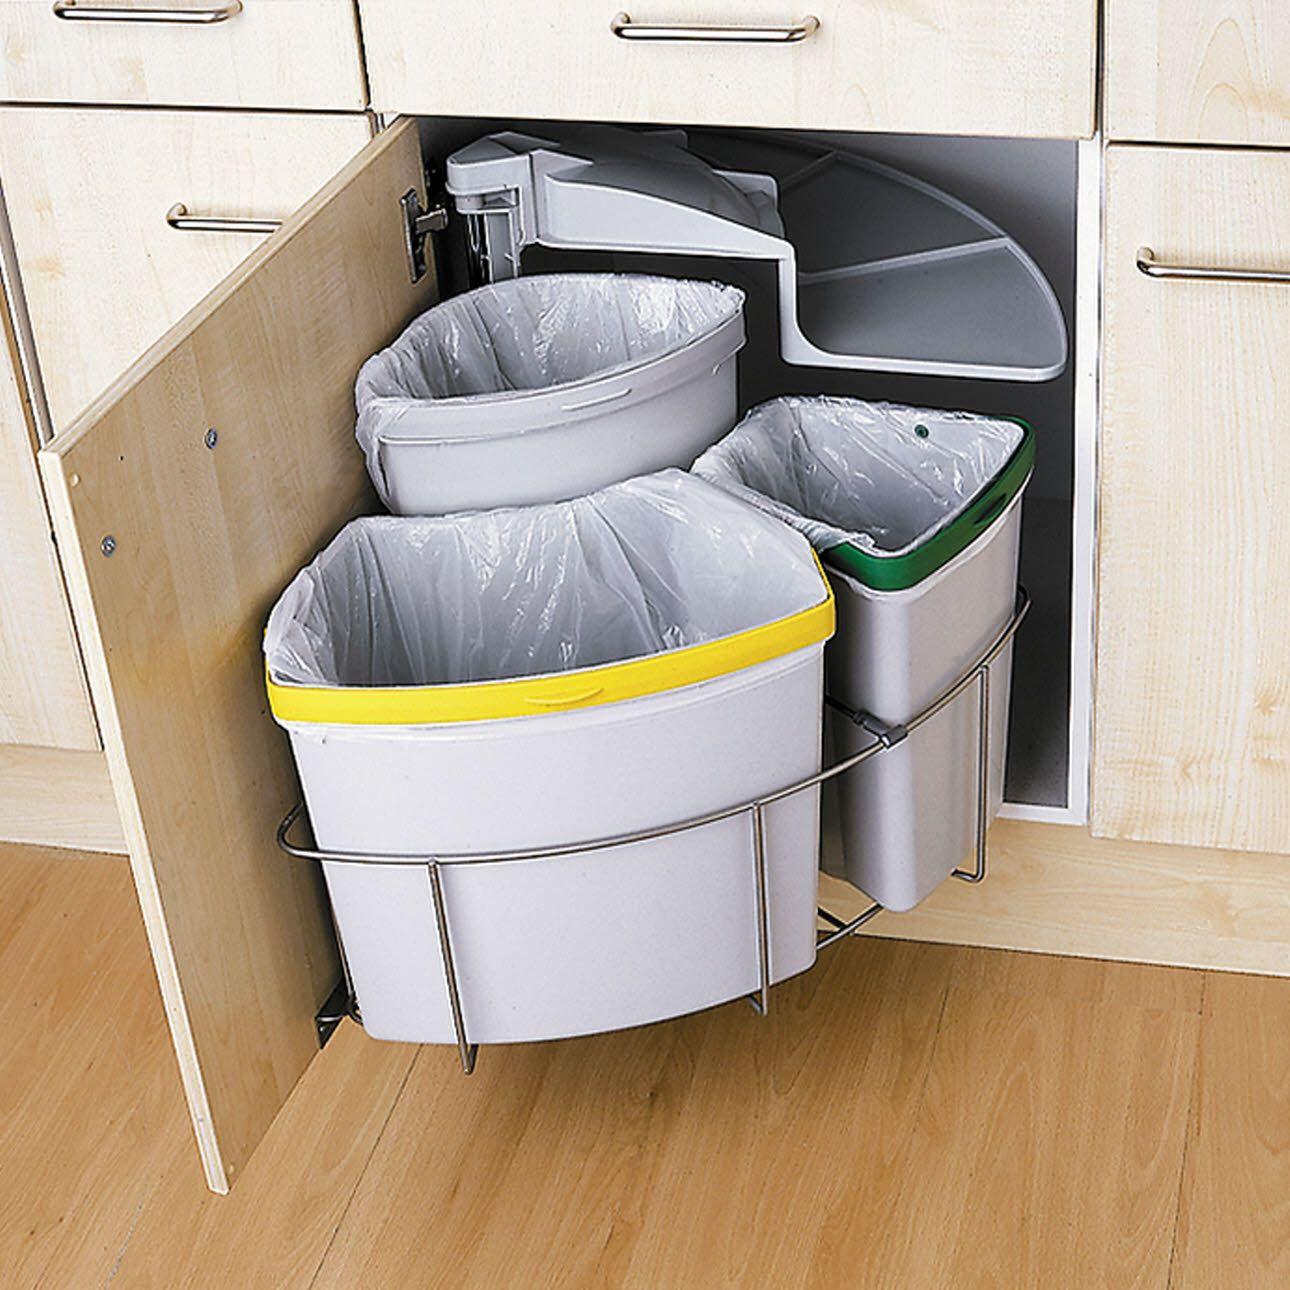 Kitchen Cabinet Three Part Recycling Bin Recycle Recycling Storage Three Part Recycling Bin Recycle Recycling Storage Kitchen Bin Integrated Kitchen Bins